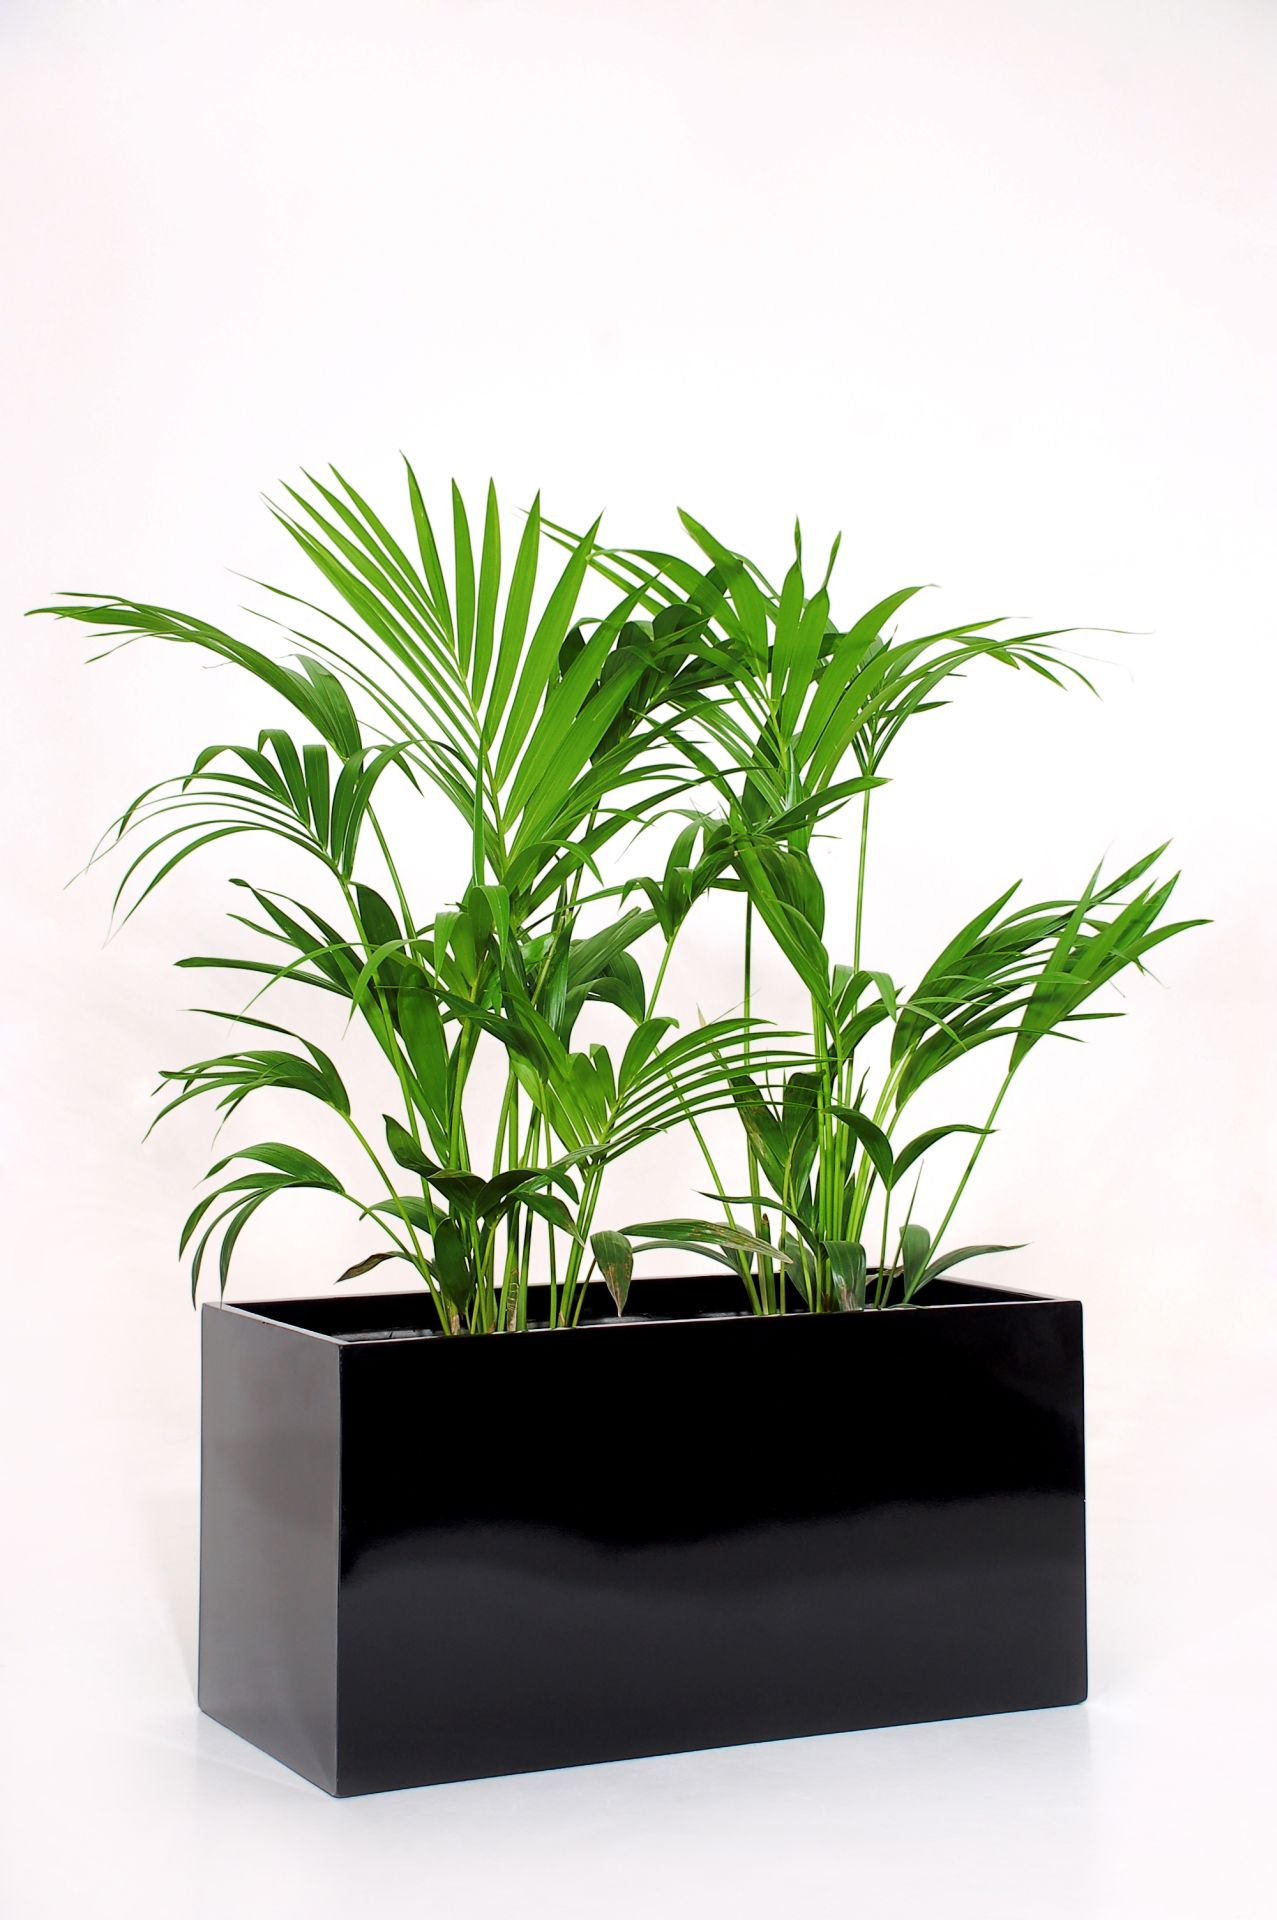 Blumenk bel pflanzk bel pflanzgef pflanztrog fiberglas for Fiberglas eigenschaften